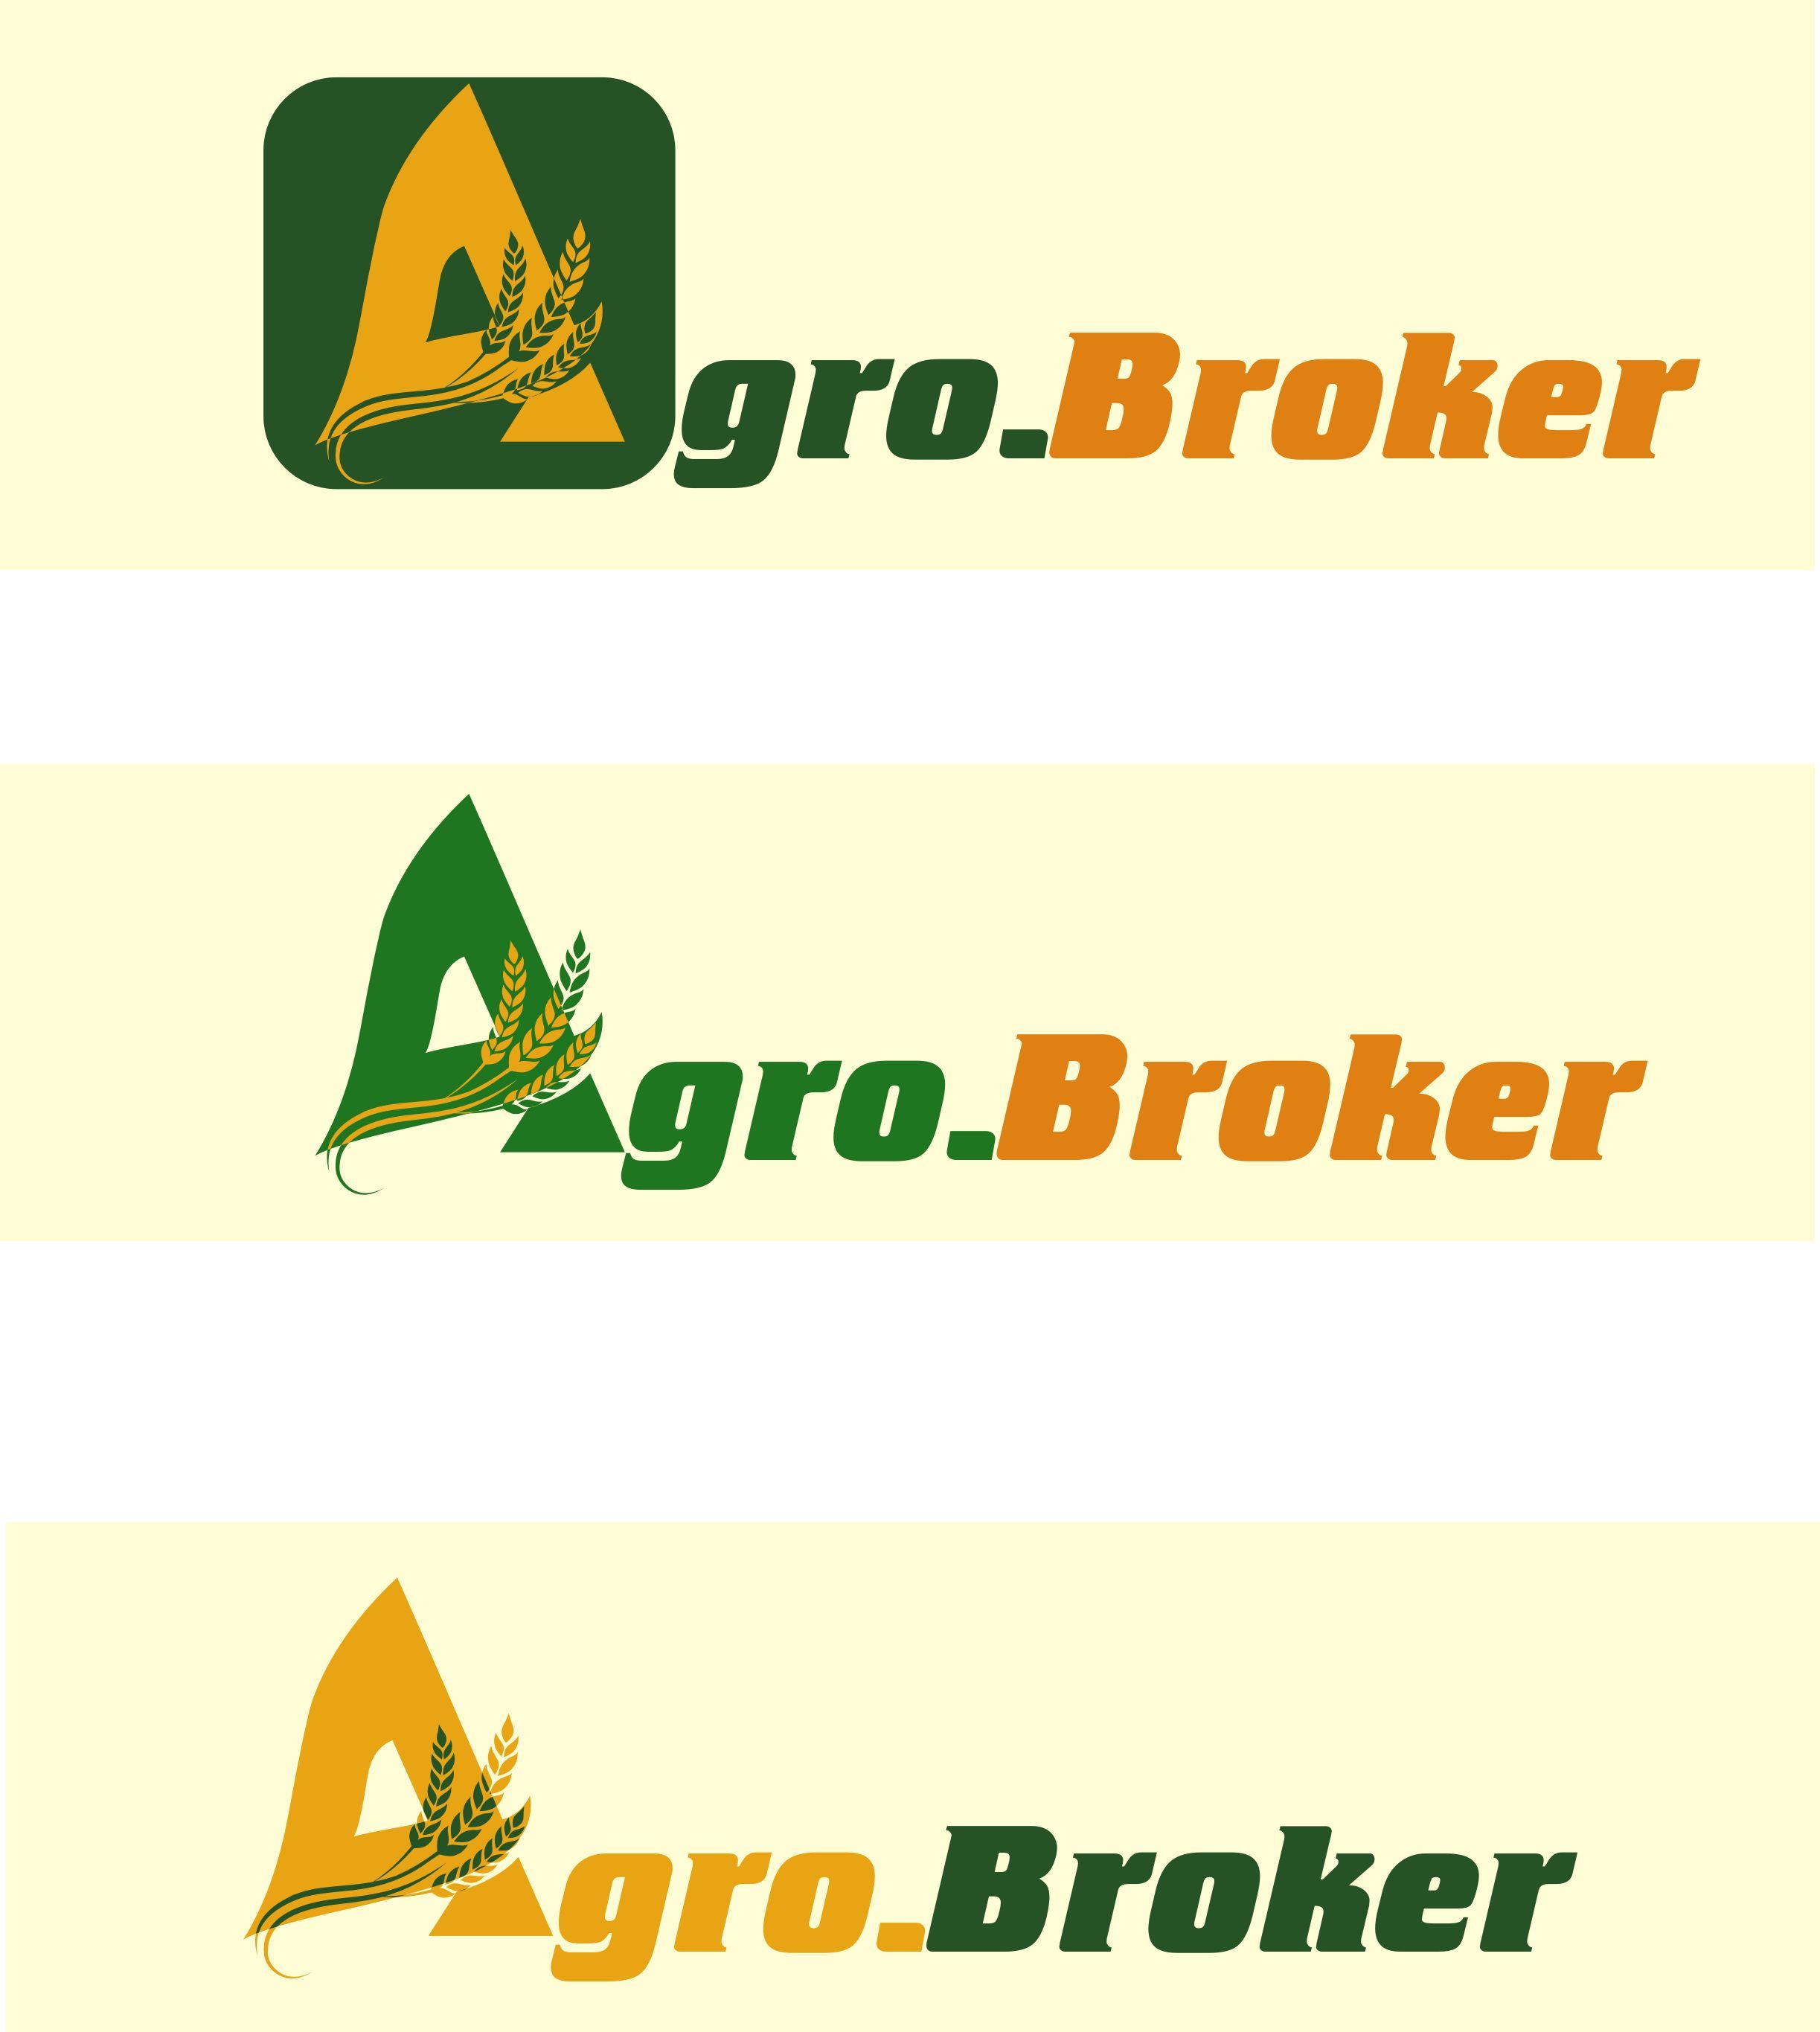 ТЗ на разработку пакета айдентики Agro.Broker фото f_658596cb889ccaec.jpg